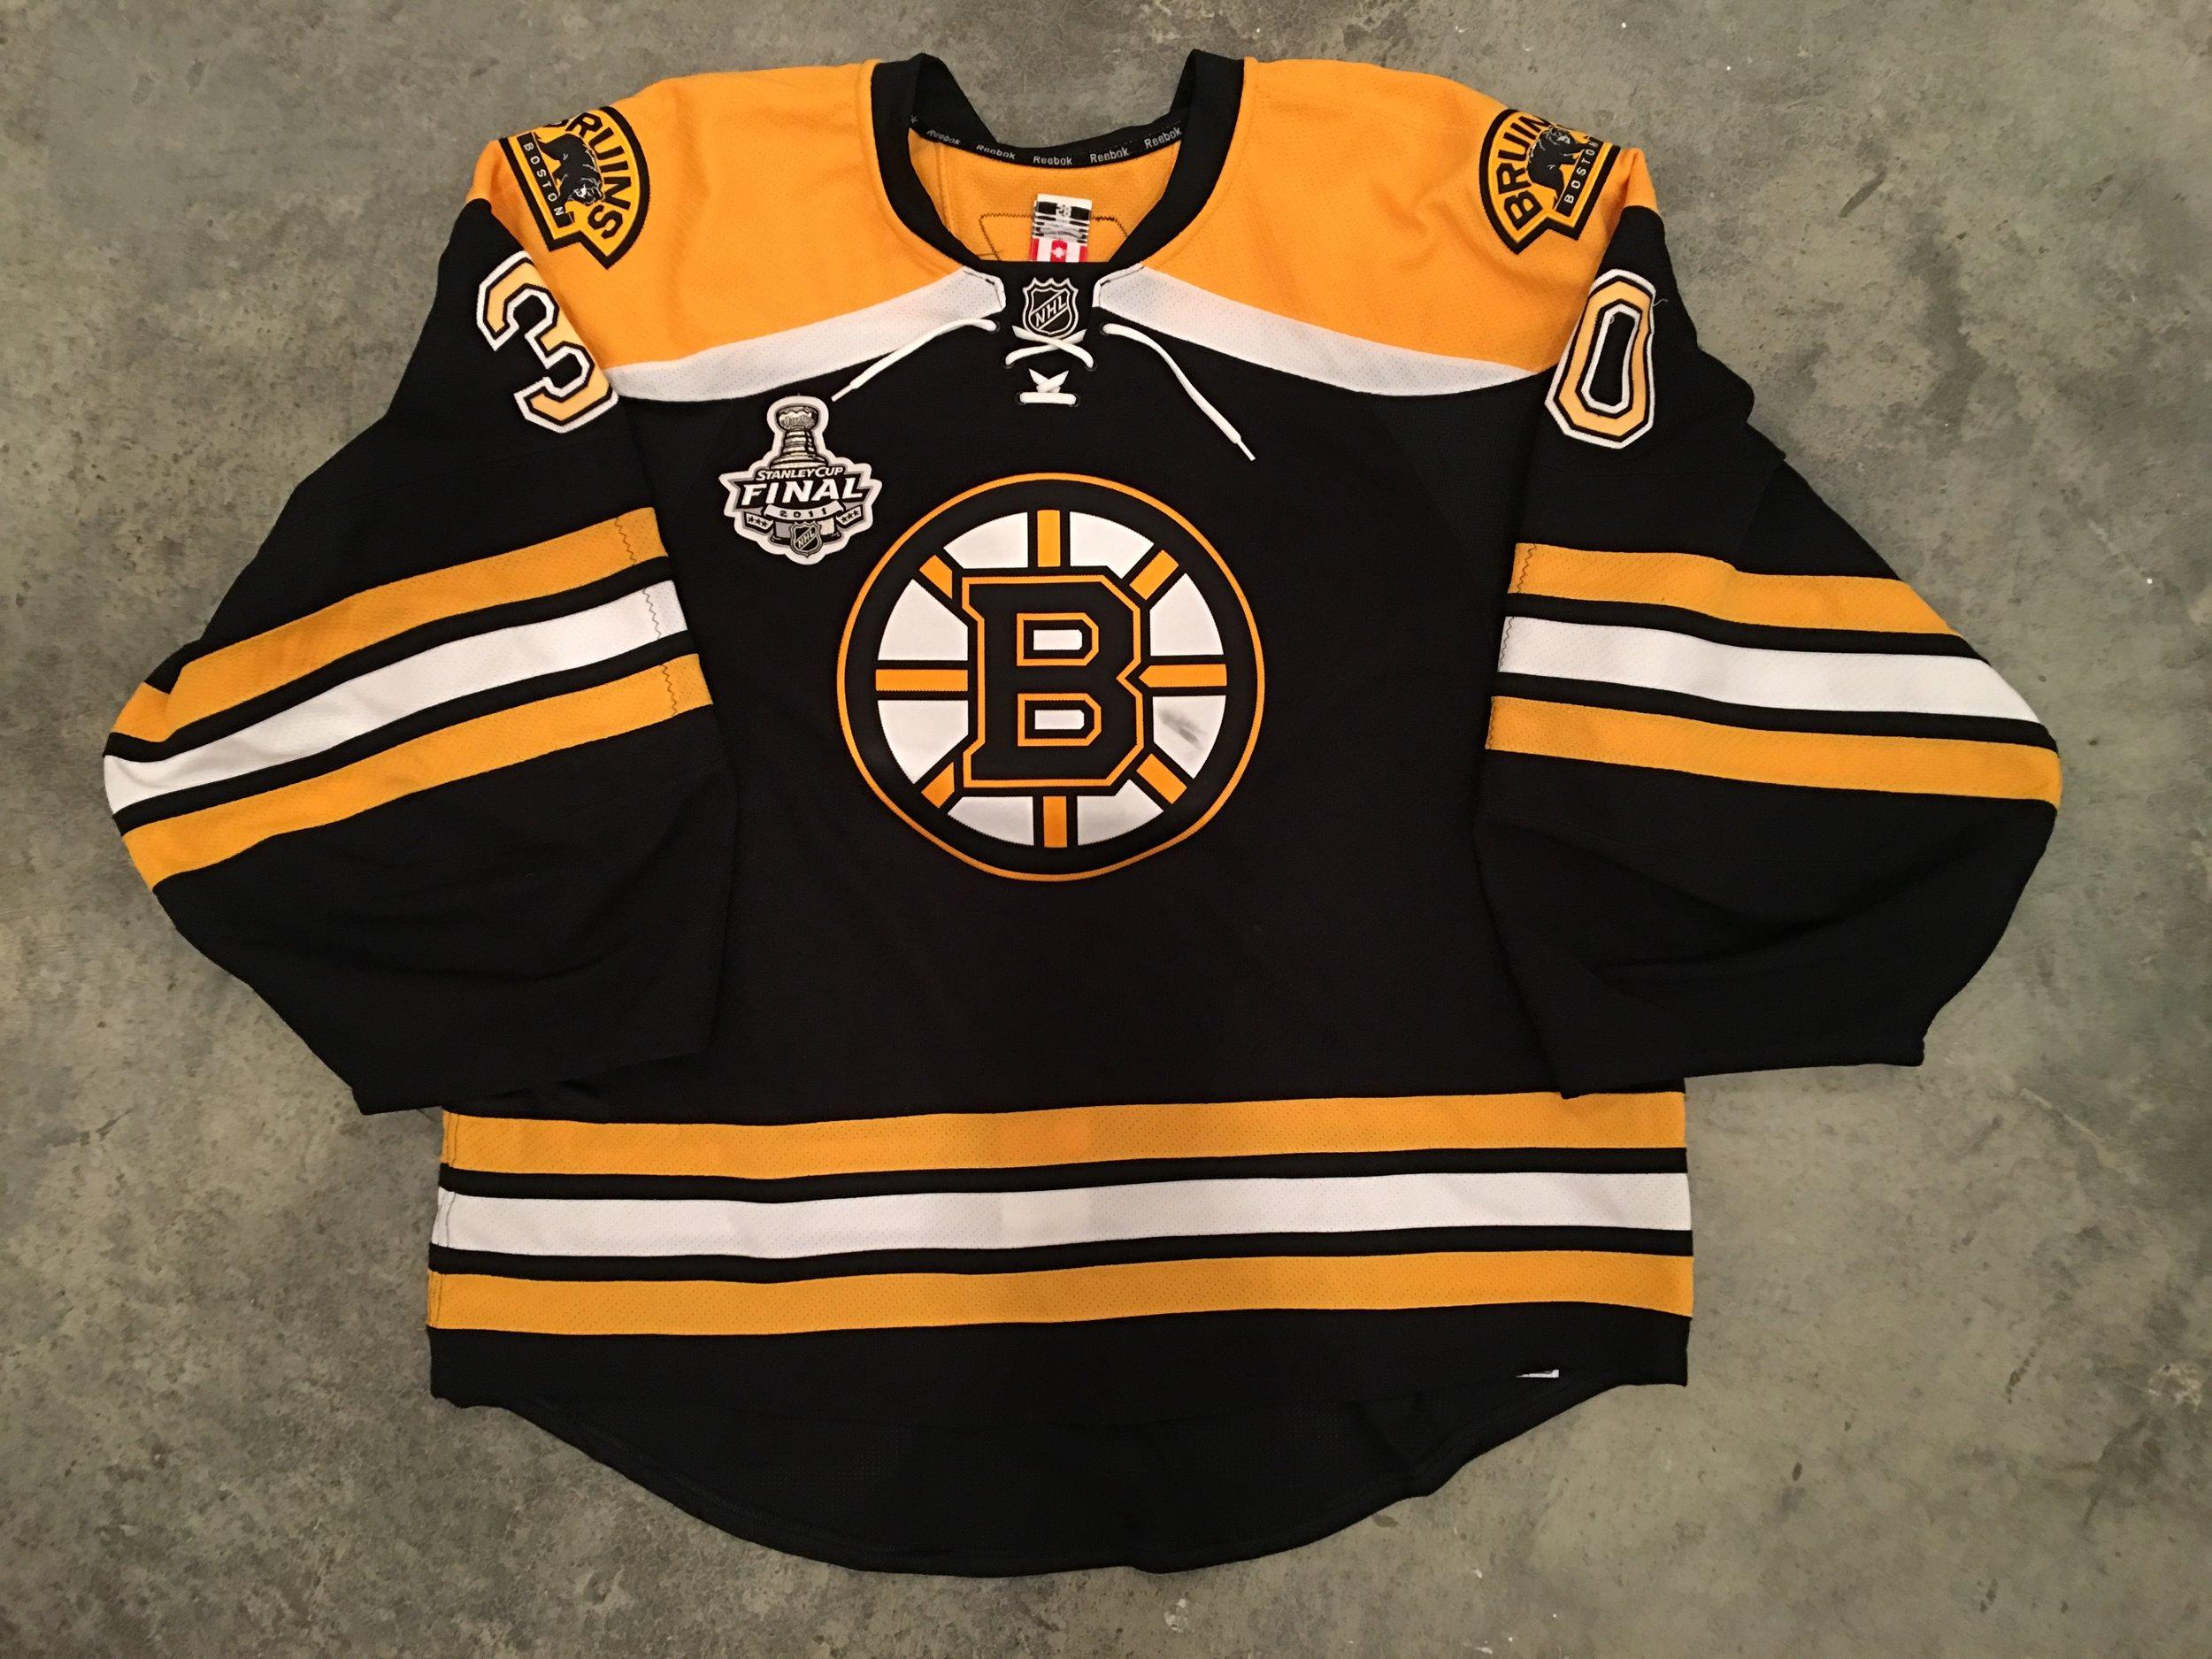 2011 Boston Bruins Stanley Cup Finals Game Worn Home Jersey - Tim Thomas - Conn Smythe Winner